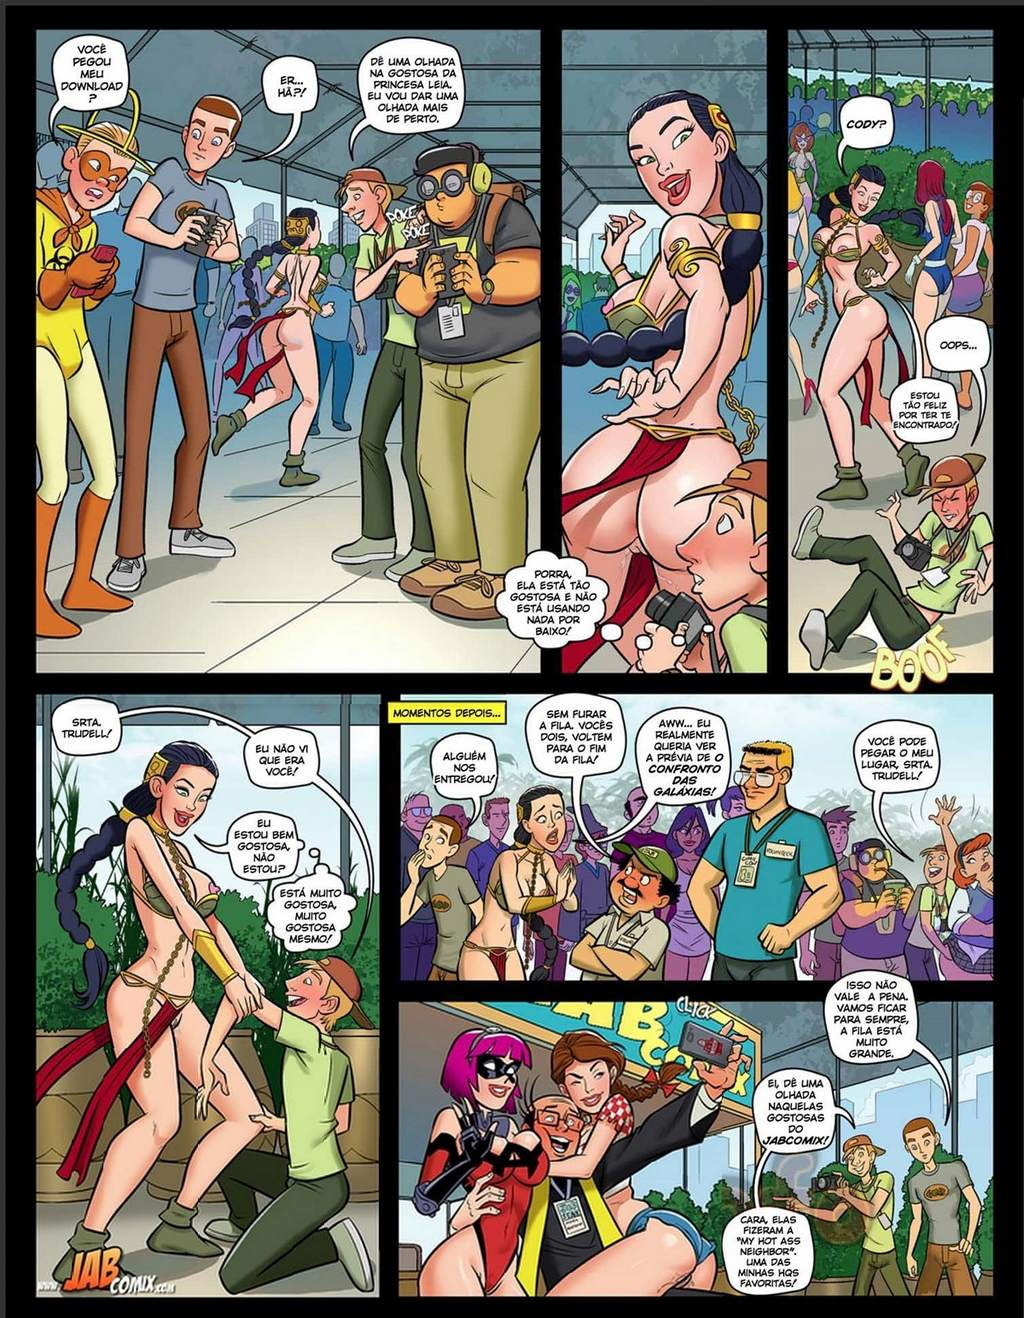 Nerd 2 Mark Kleanup Incesto The Hentai P.03 - hentai, comics-hq